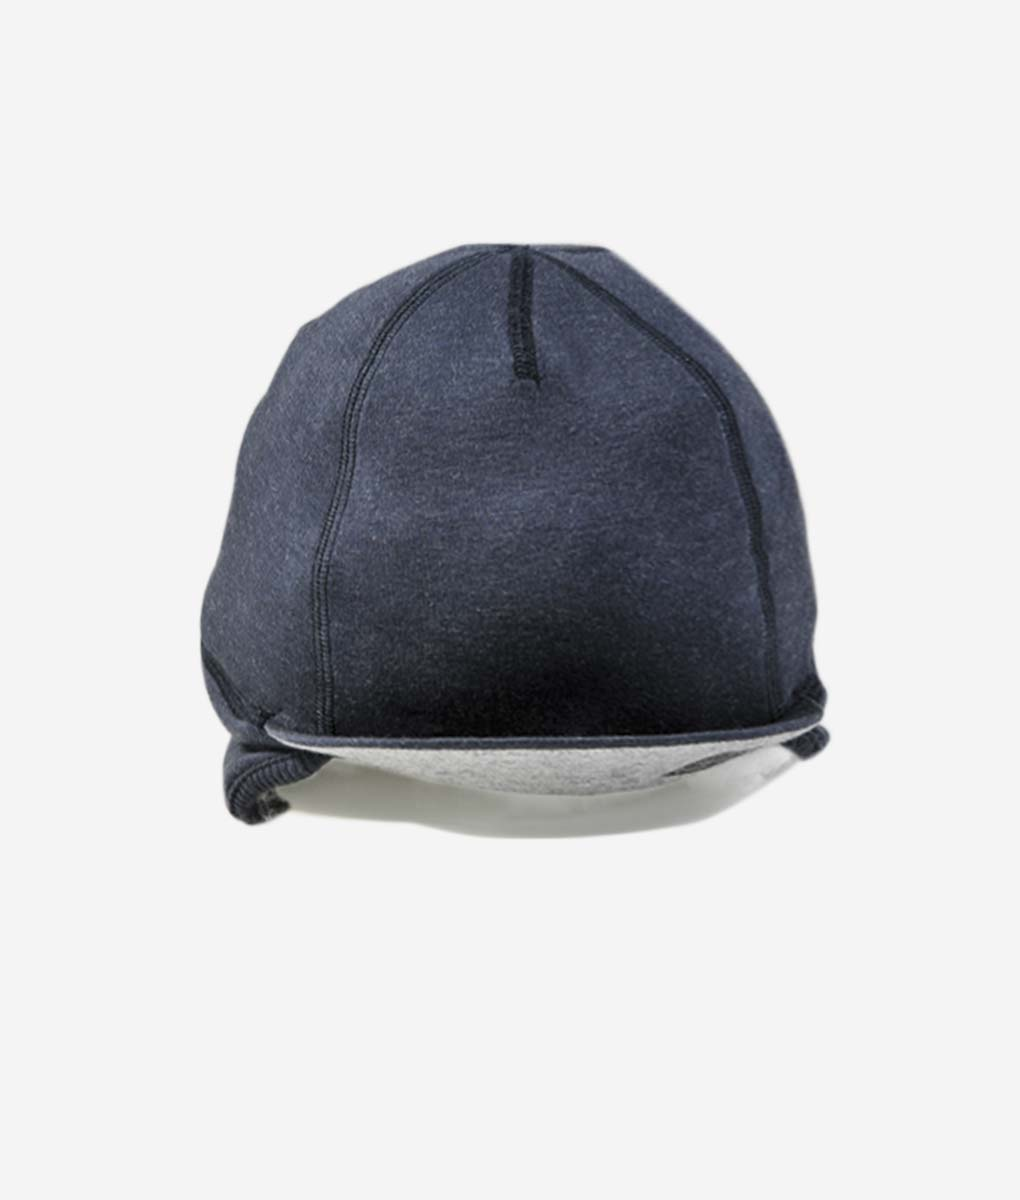 winter-merino-cycling-cap